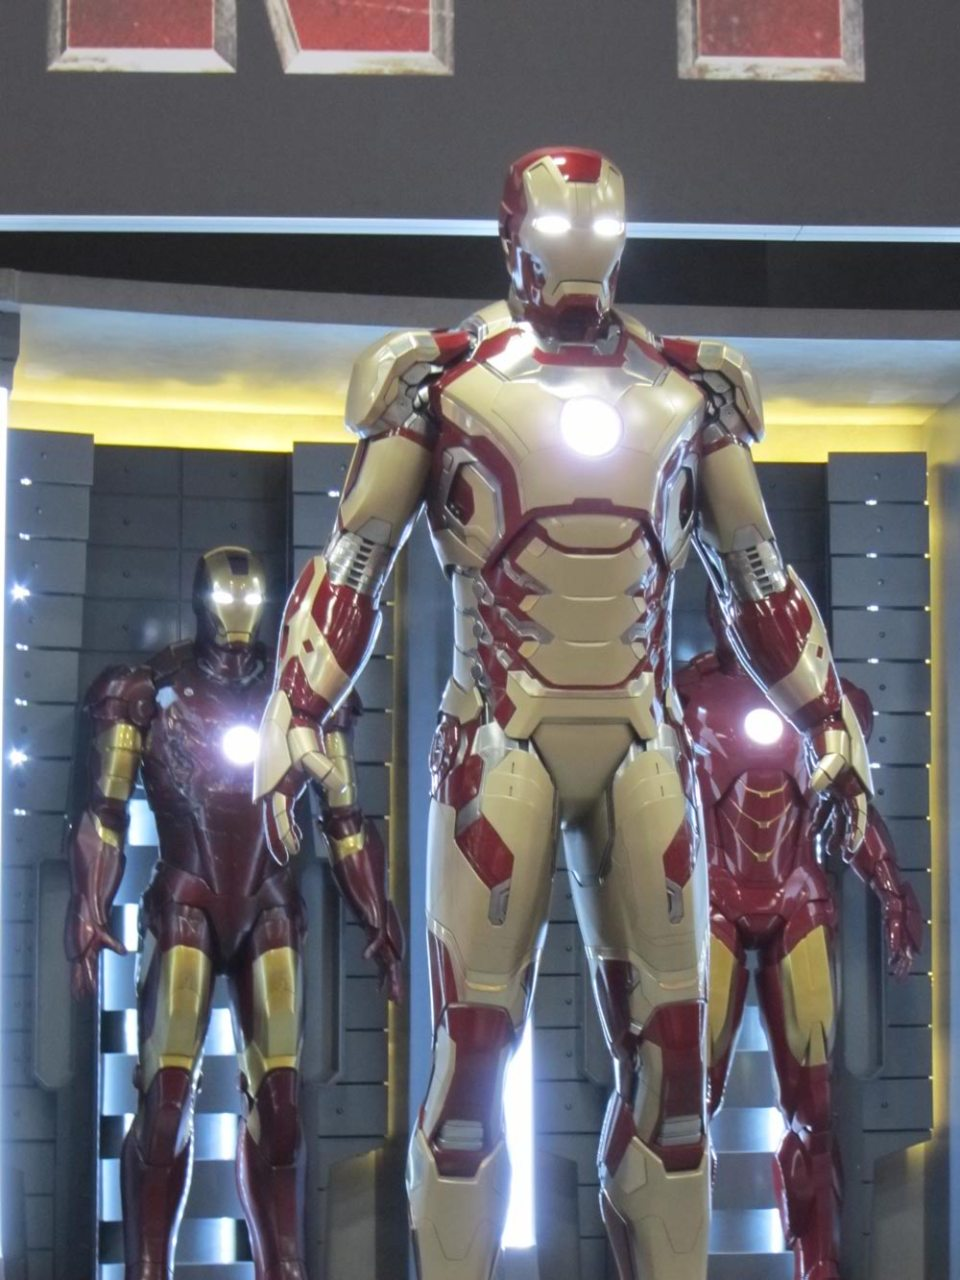 New Iron Man 3 Armor Revealed (4)